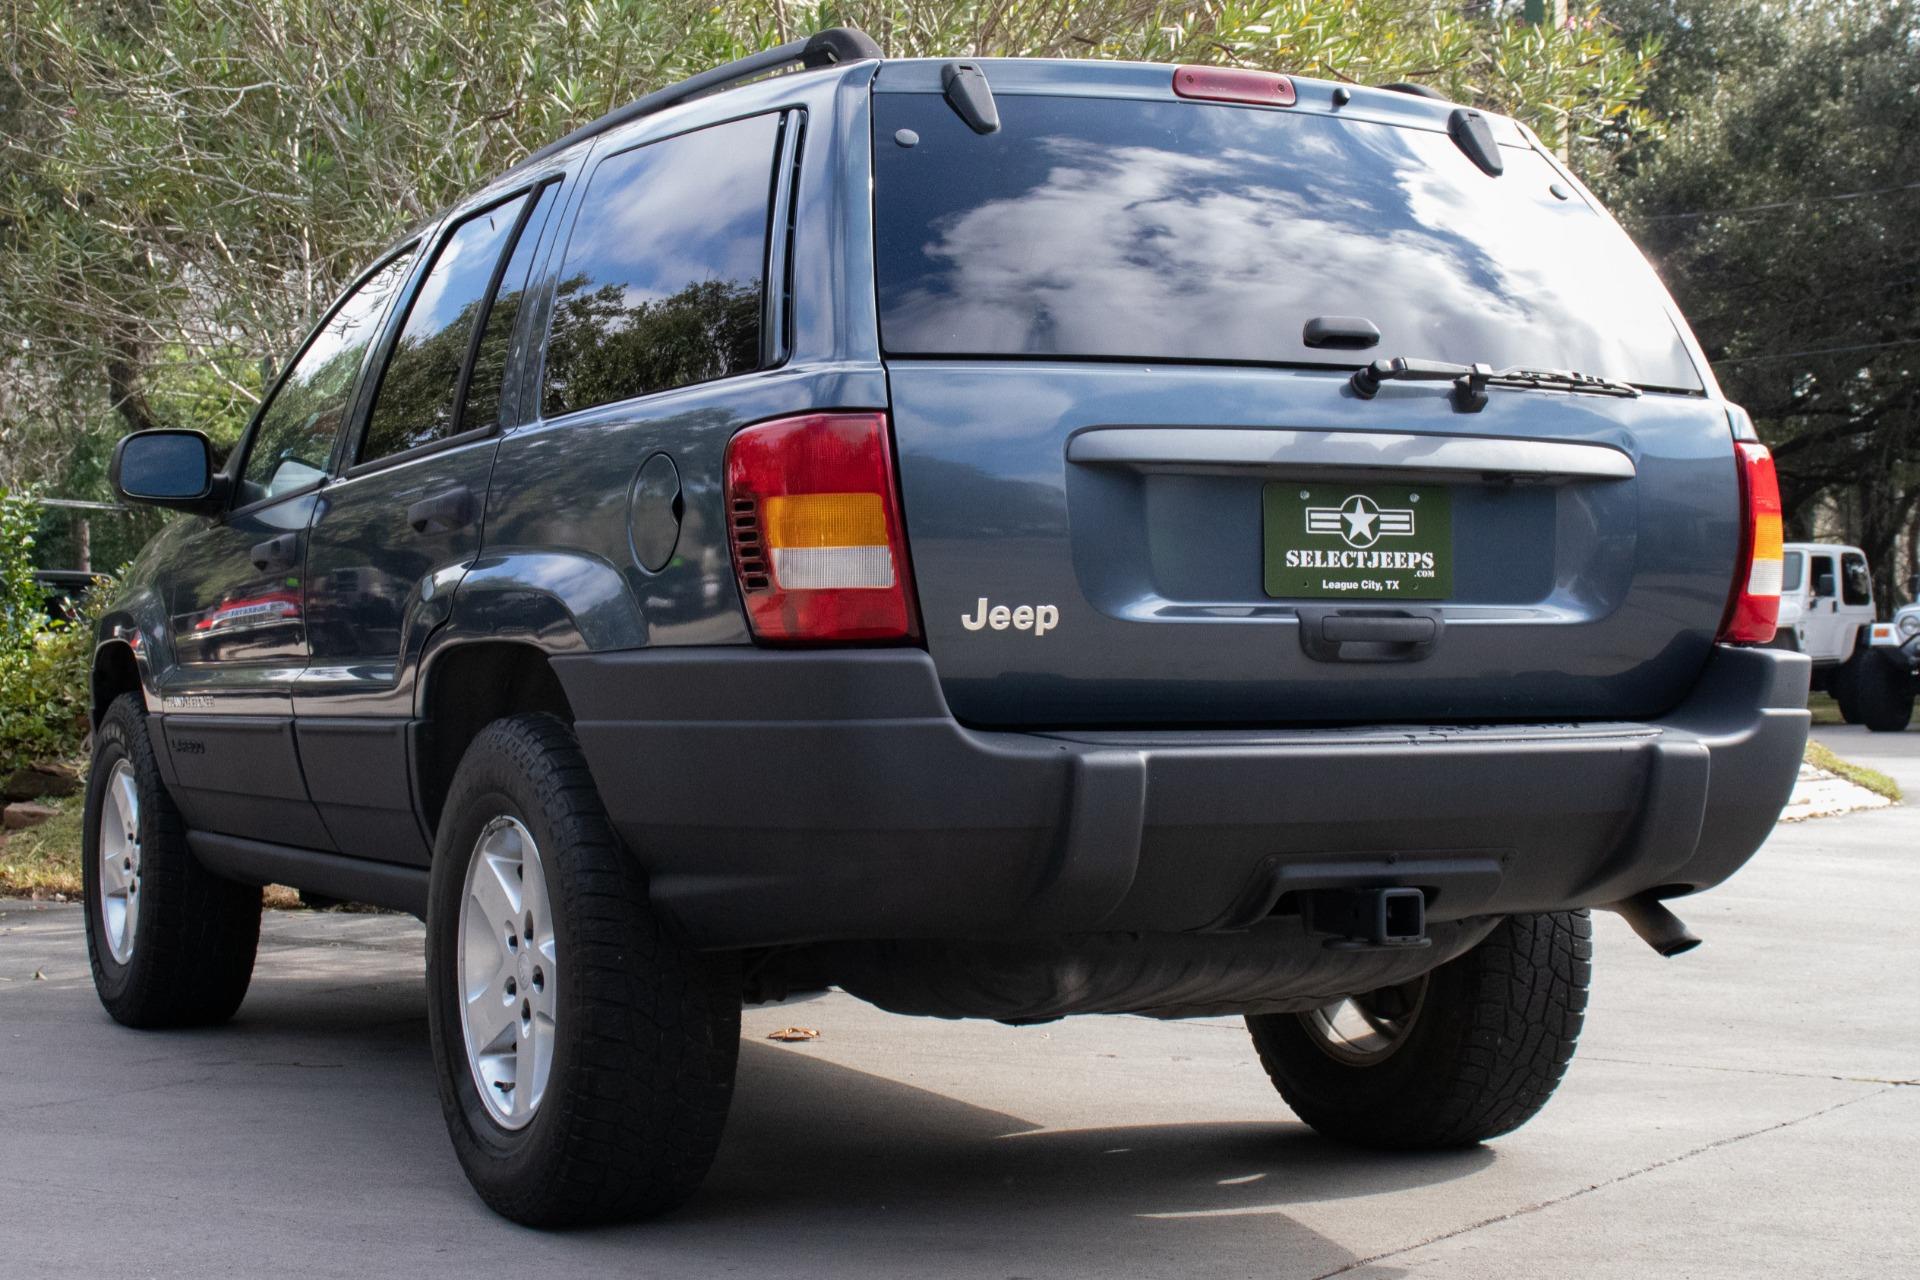 Used-2002-Jeep-Grand-Cherokee-Laredo